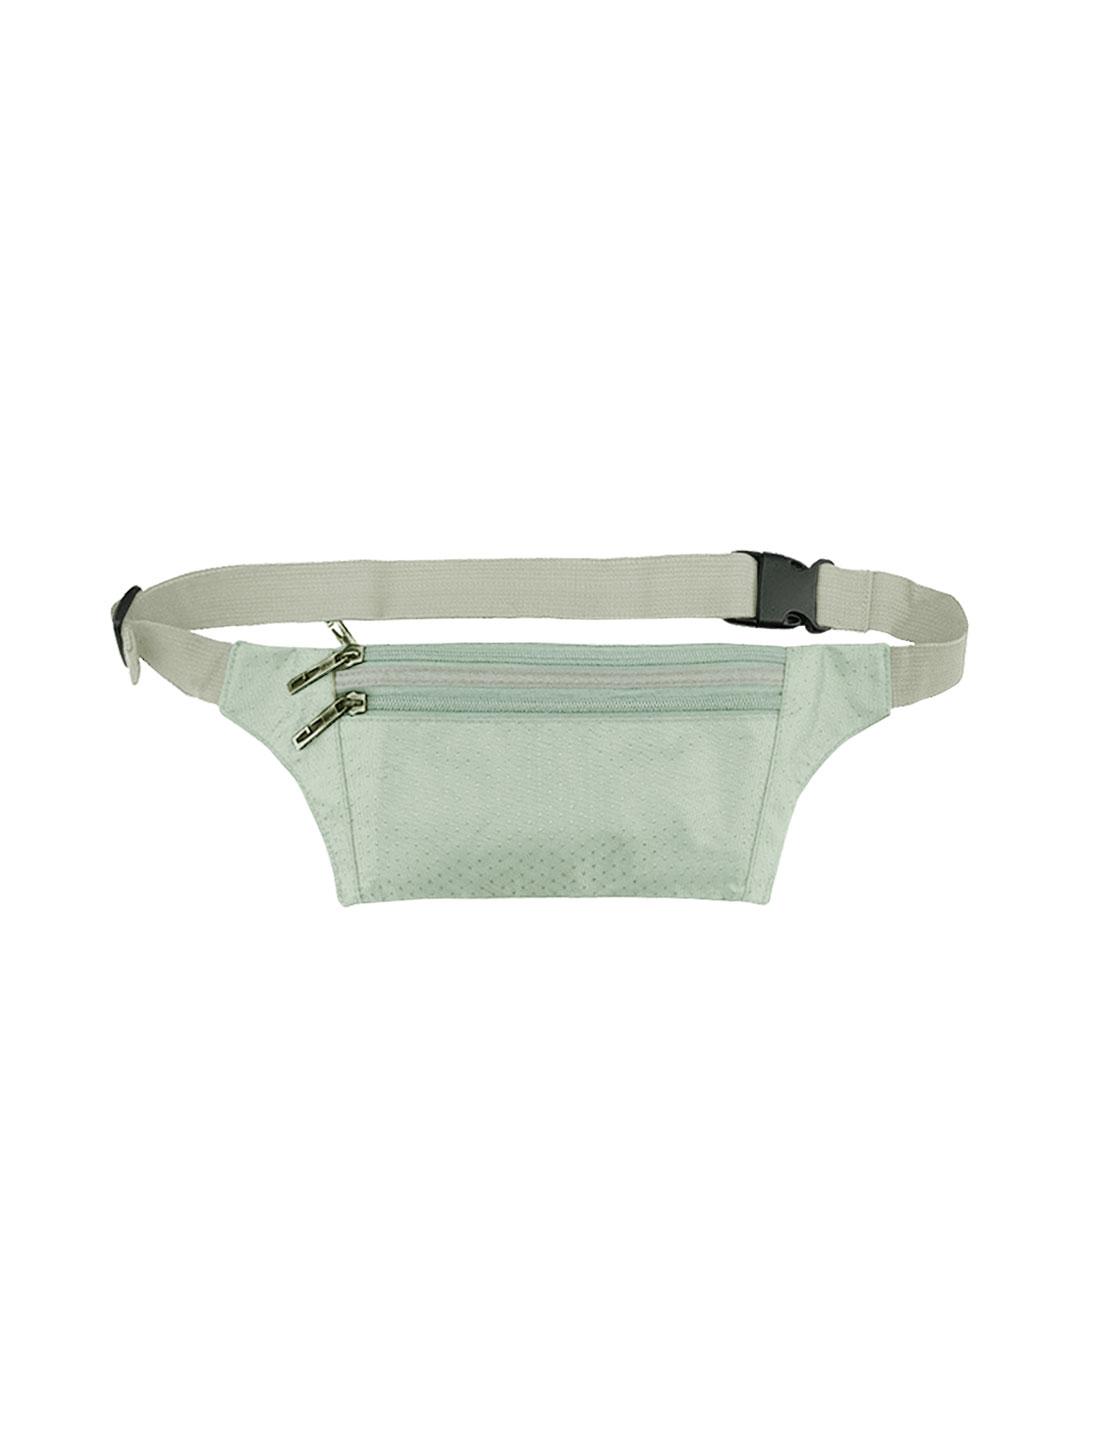 Unisex Three Zipper Pockets Argyle Design Waist Bag Silver